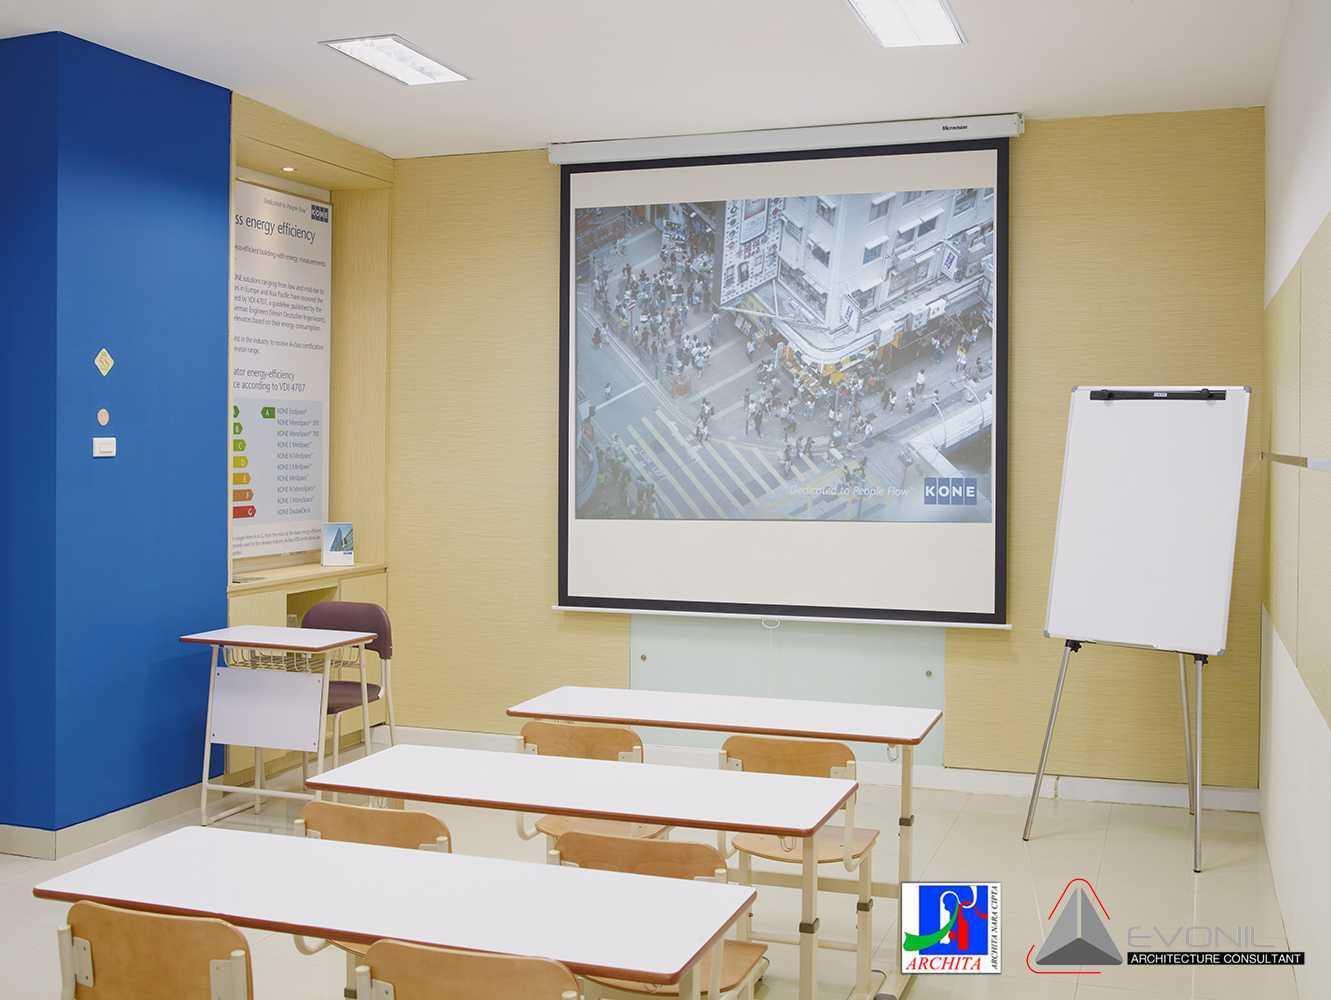 Evonil Architecture Kone Showroom & Training Center Kelapa Gading, Jakarta Kelapa Gading, Jakarta Class Modern  13177